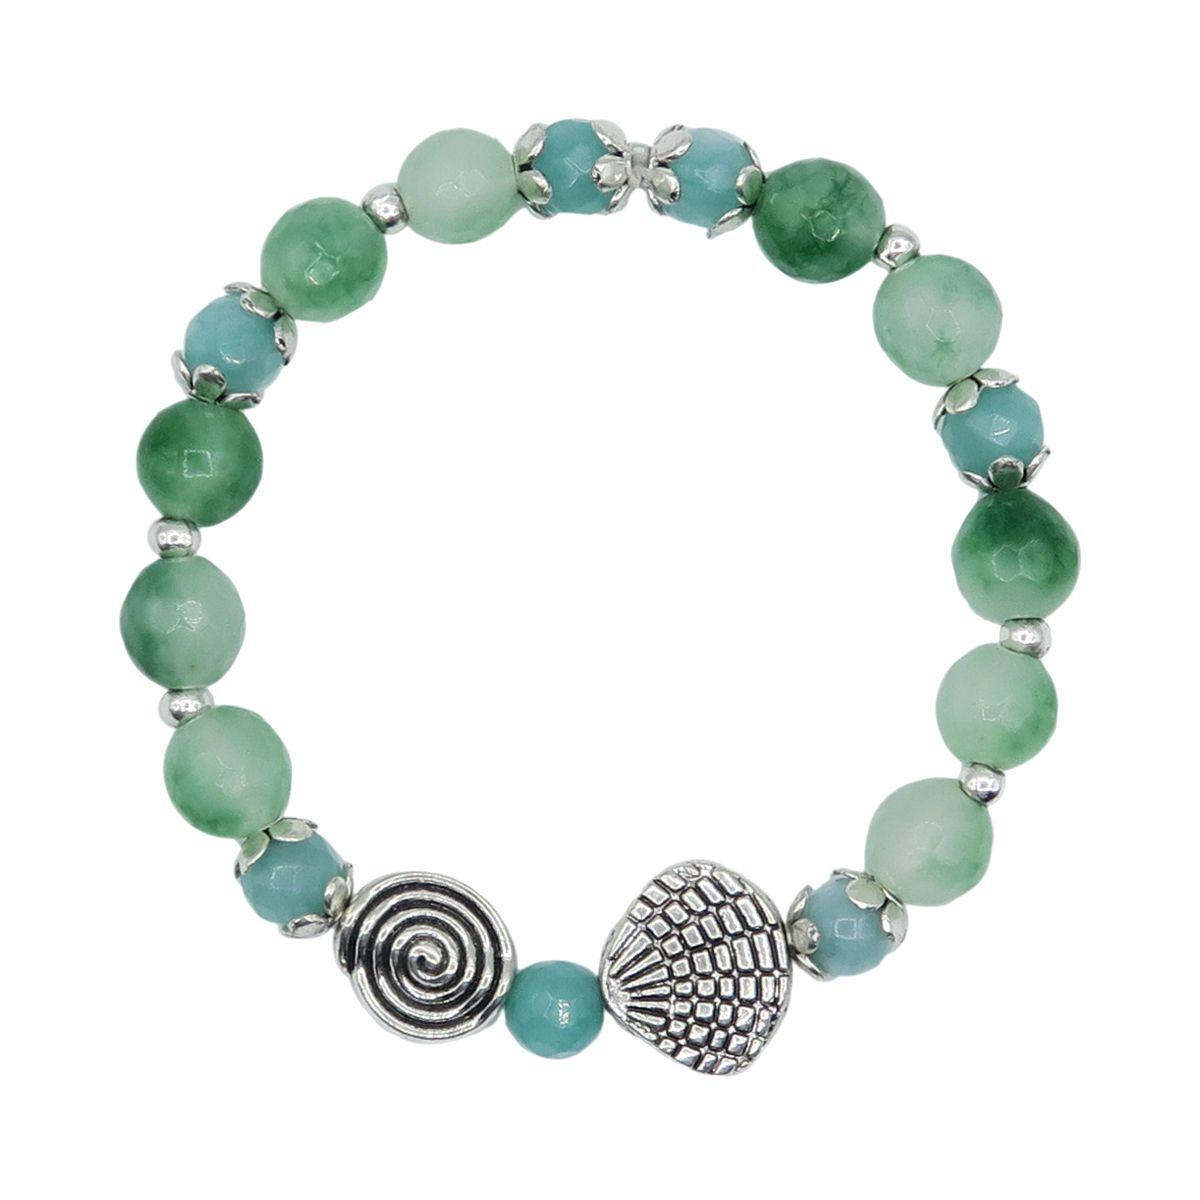 Agate Elastic Bracelet Made in Bali